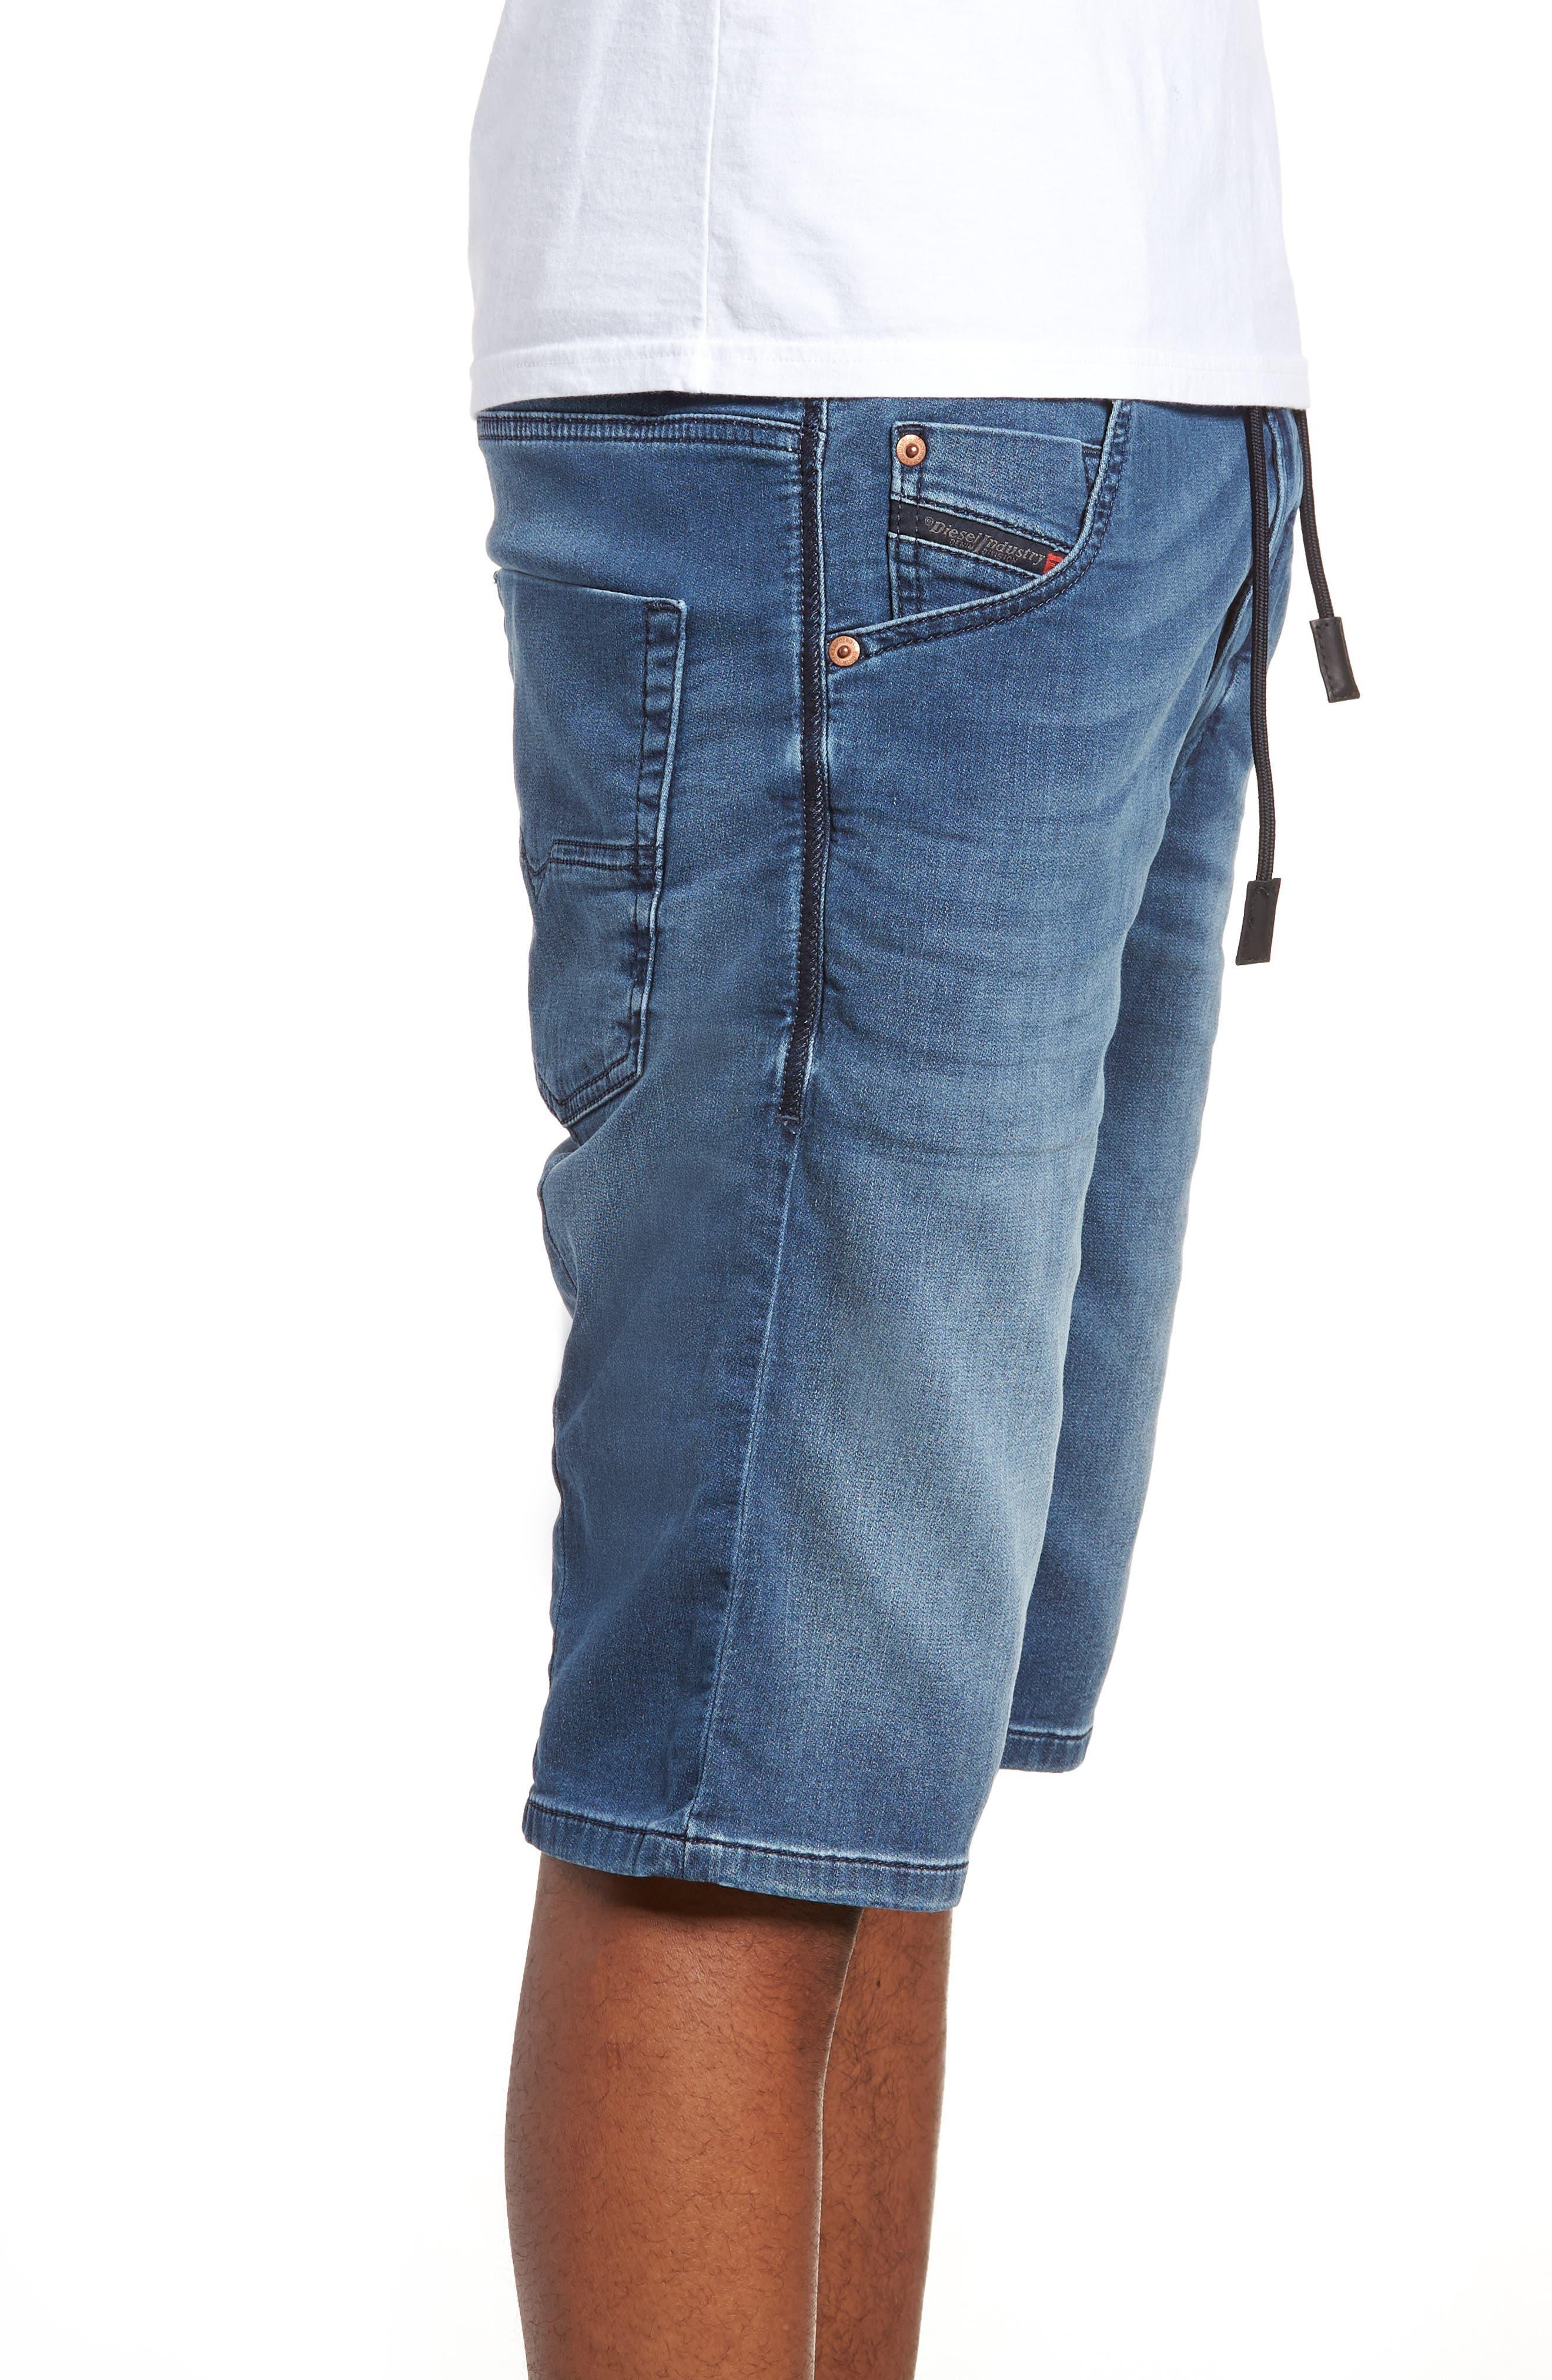 Krooshort Denim Shorts,                             Alternate thumbnail 3, color,